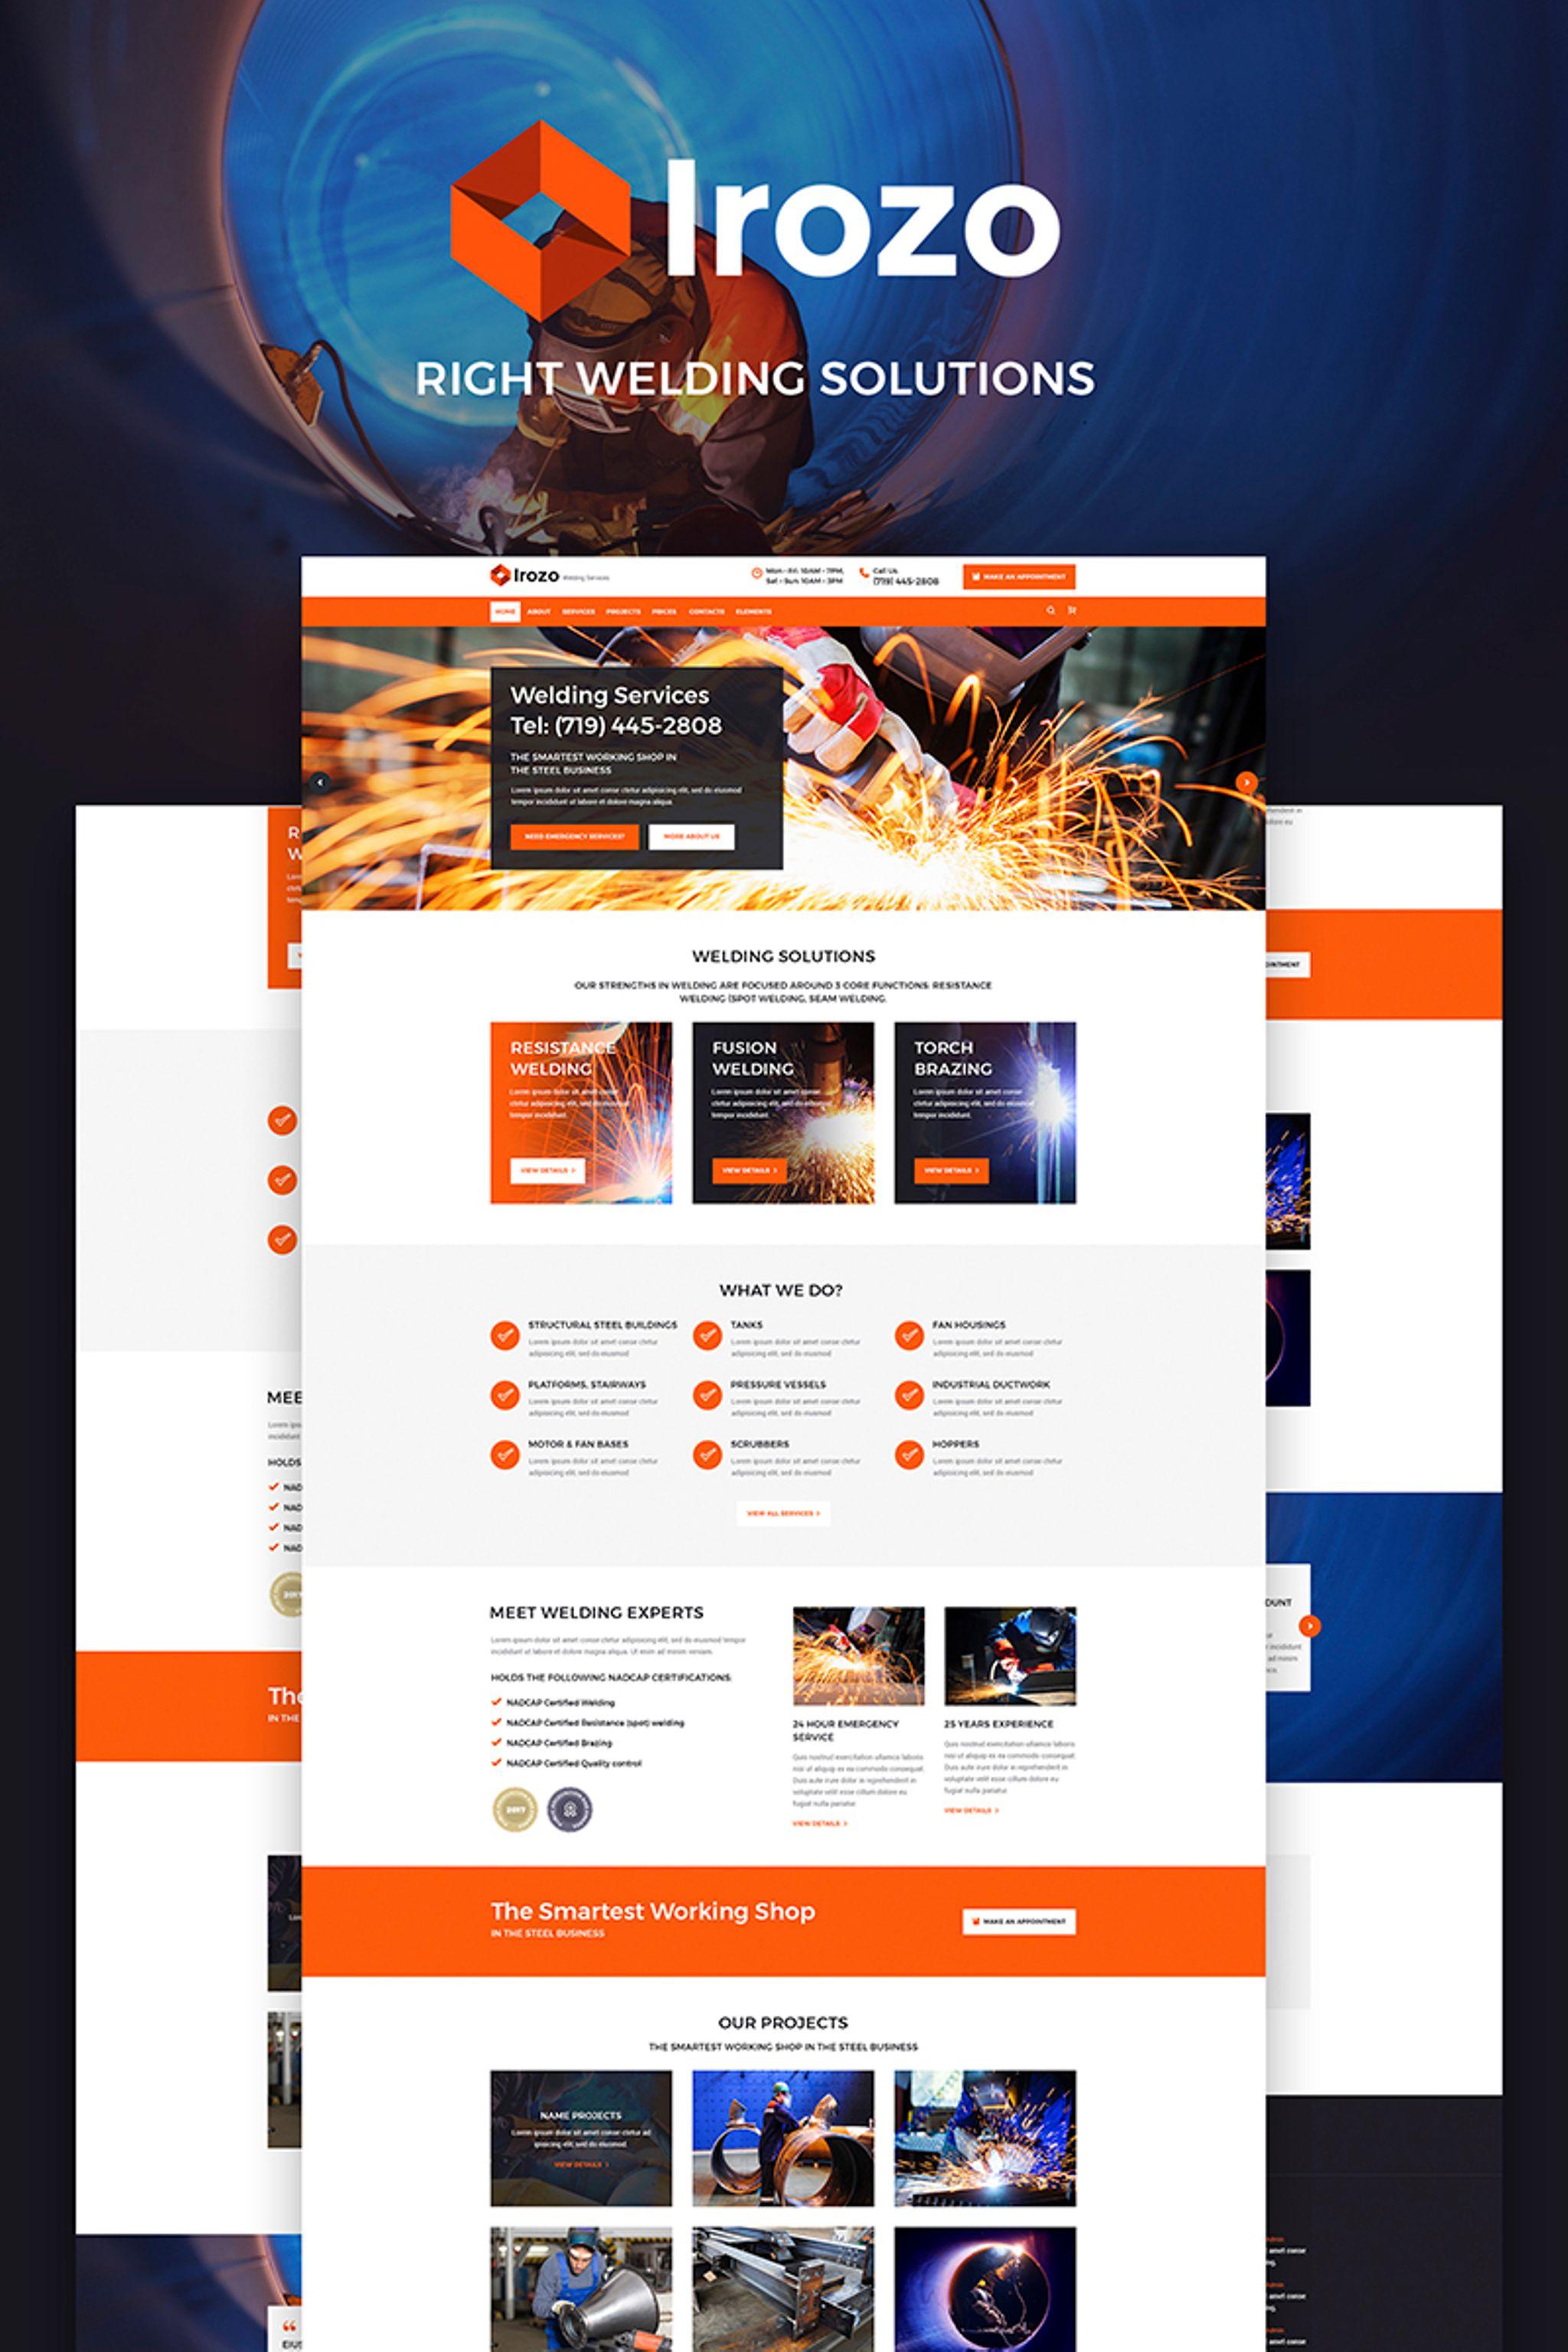 Irozo - Welding Services Tema WordPress №65888 - screenshot